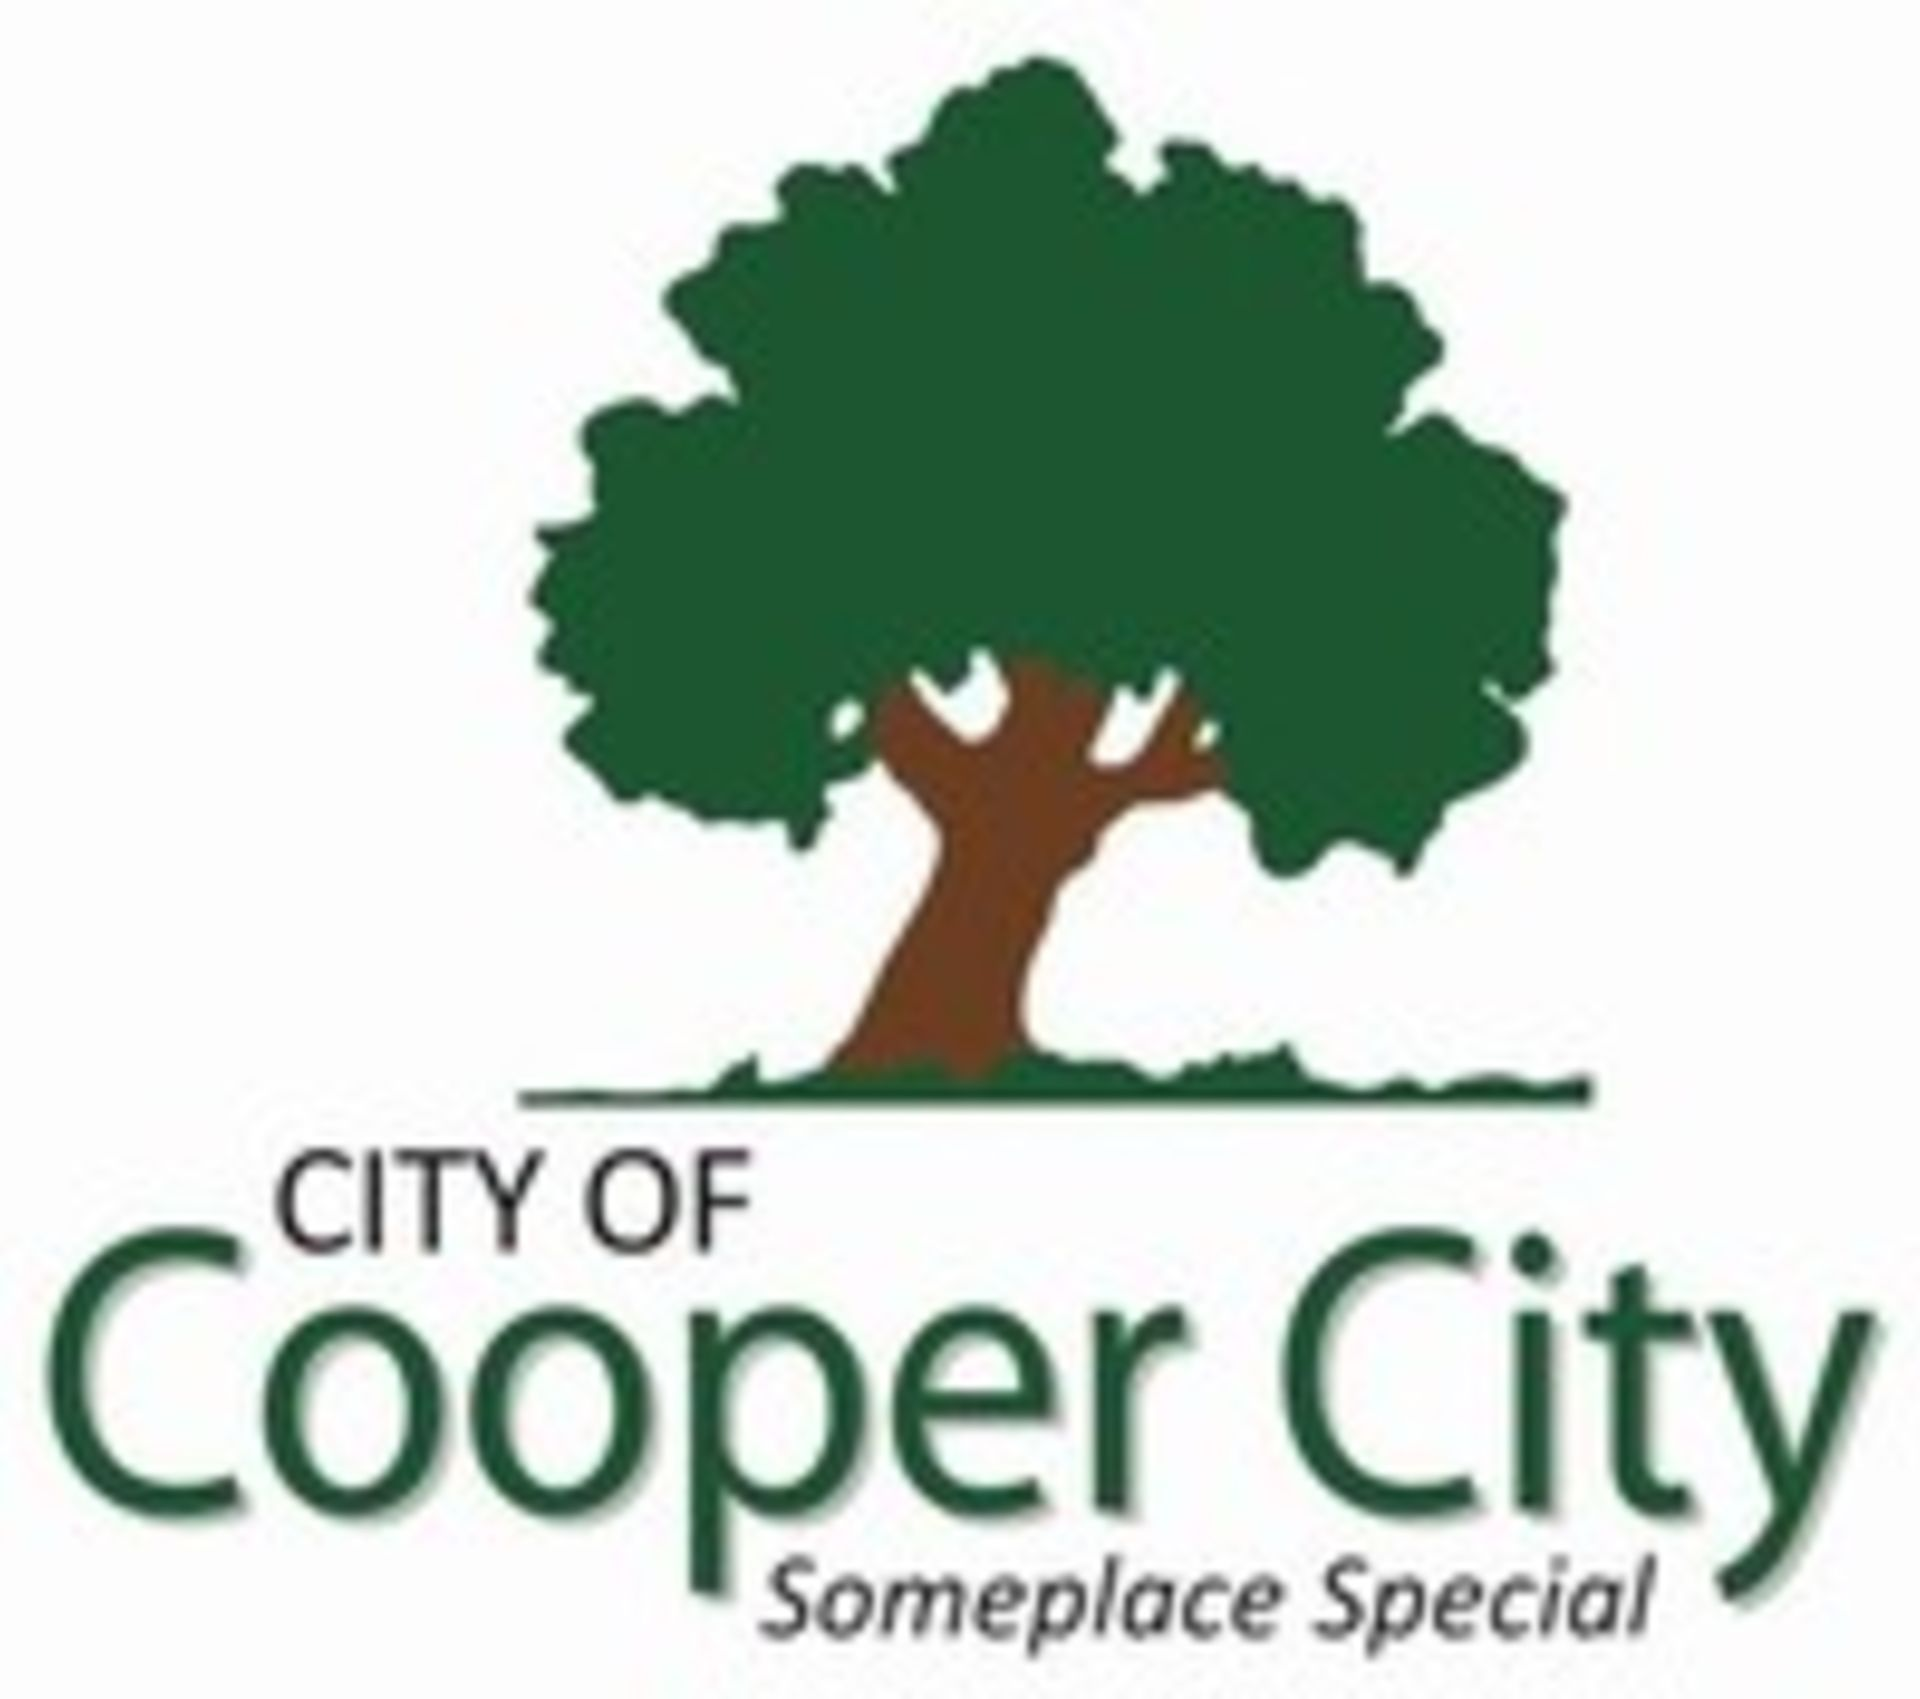 How's Life in Cooper City?